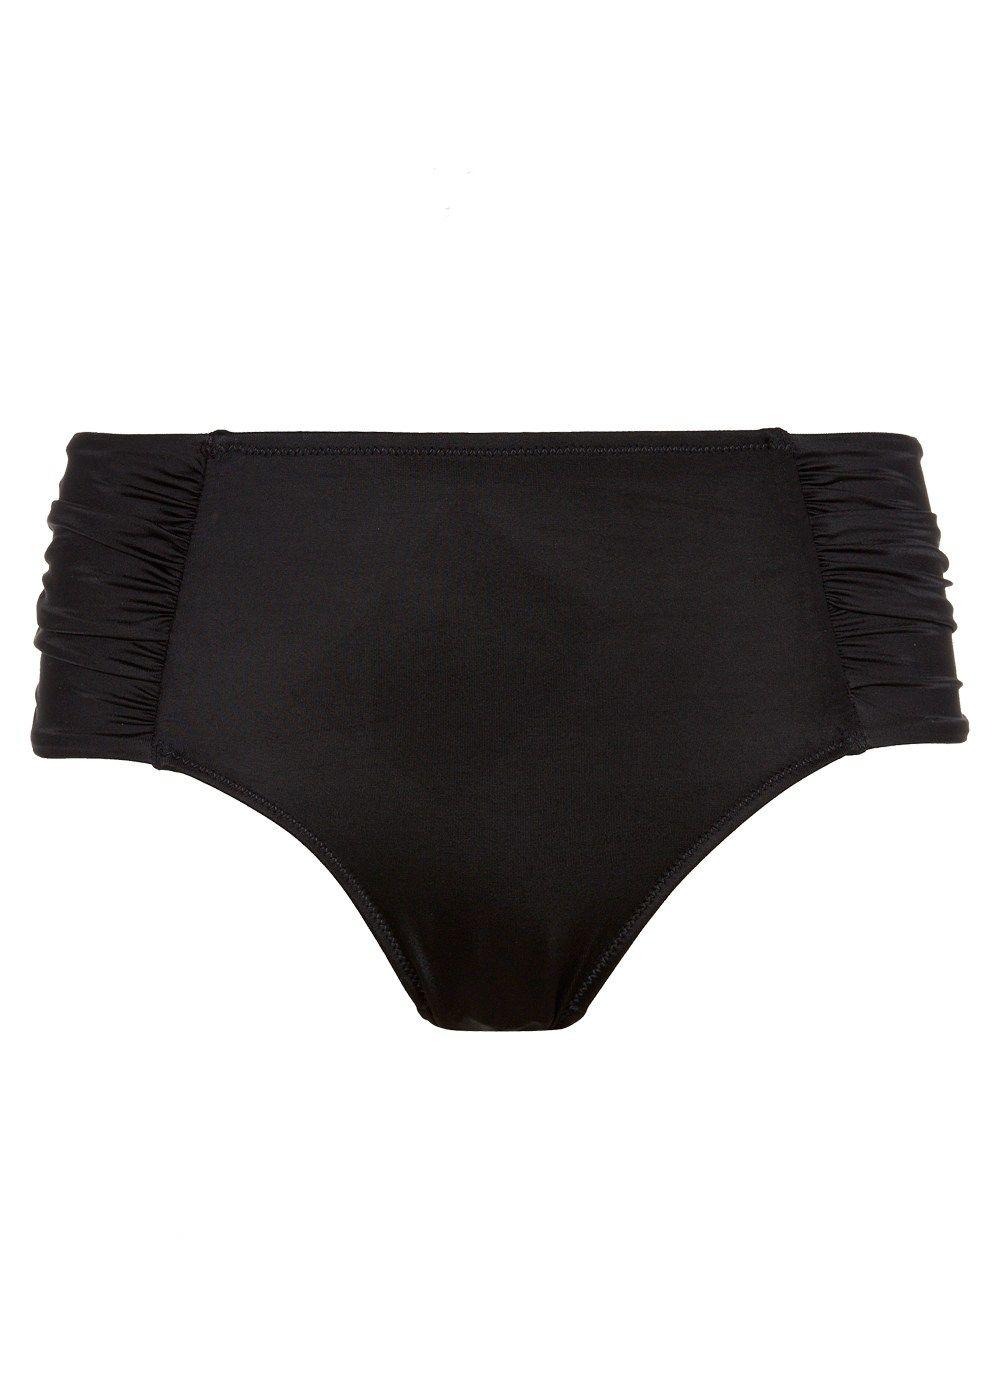 446e2b30cd8e1 Shapewear Black Mid Rise Bikini Briefs - Matalan